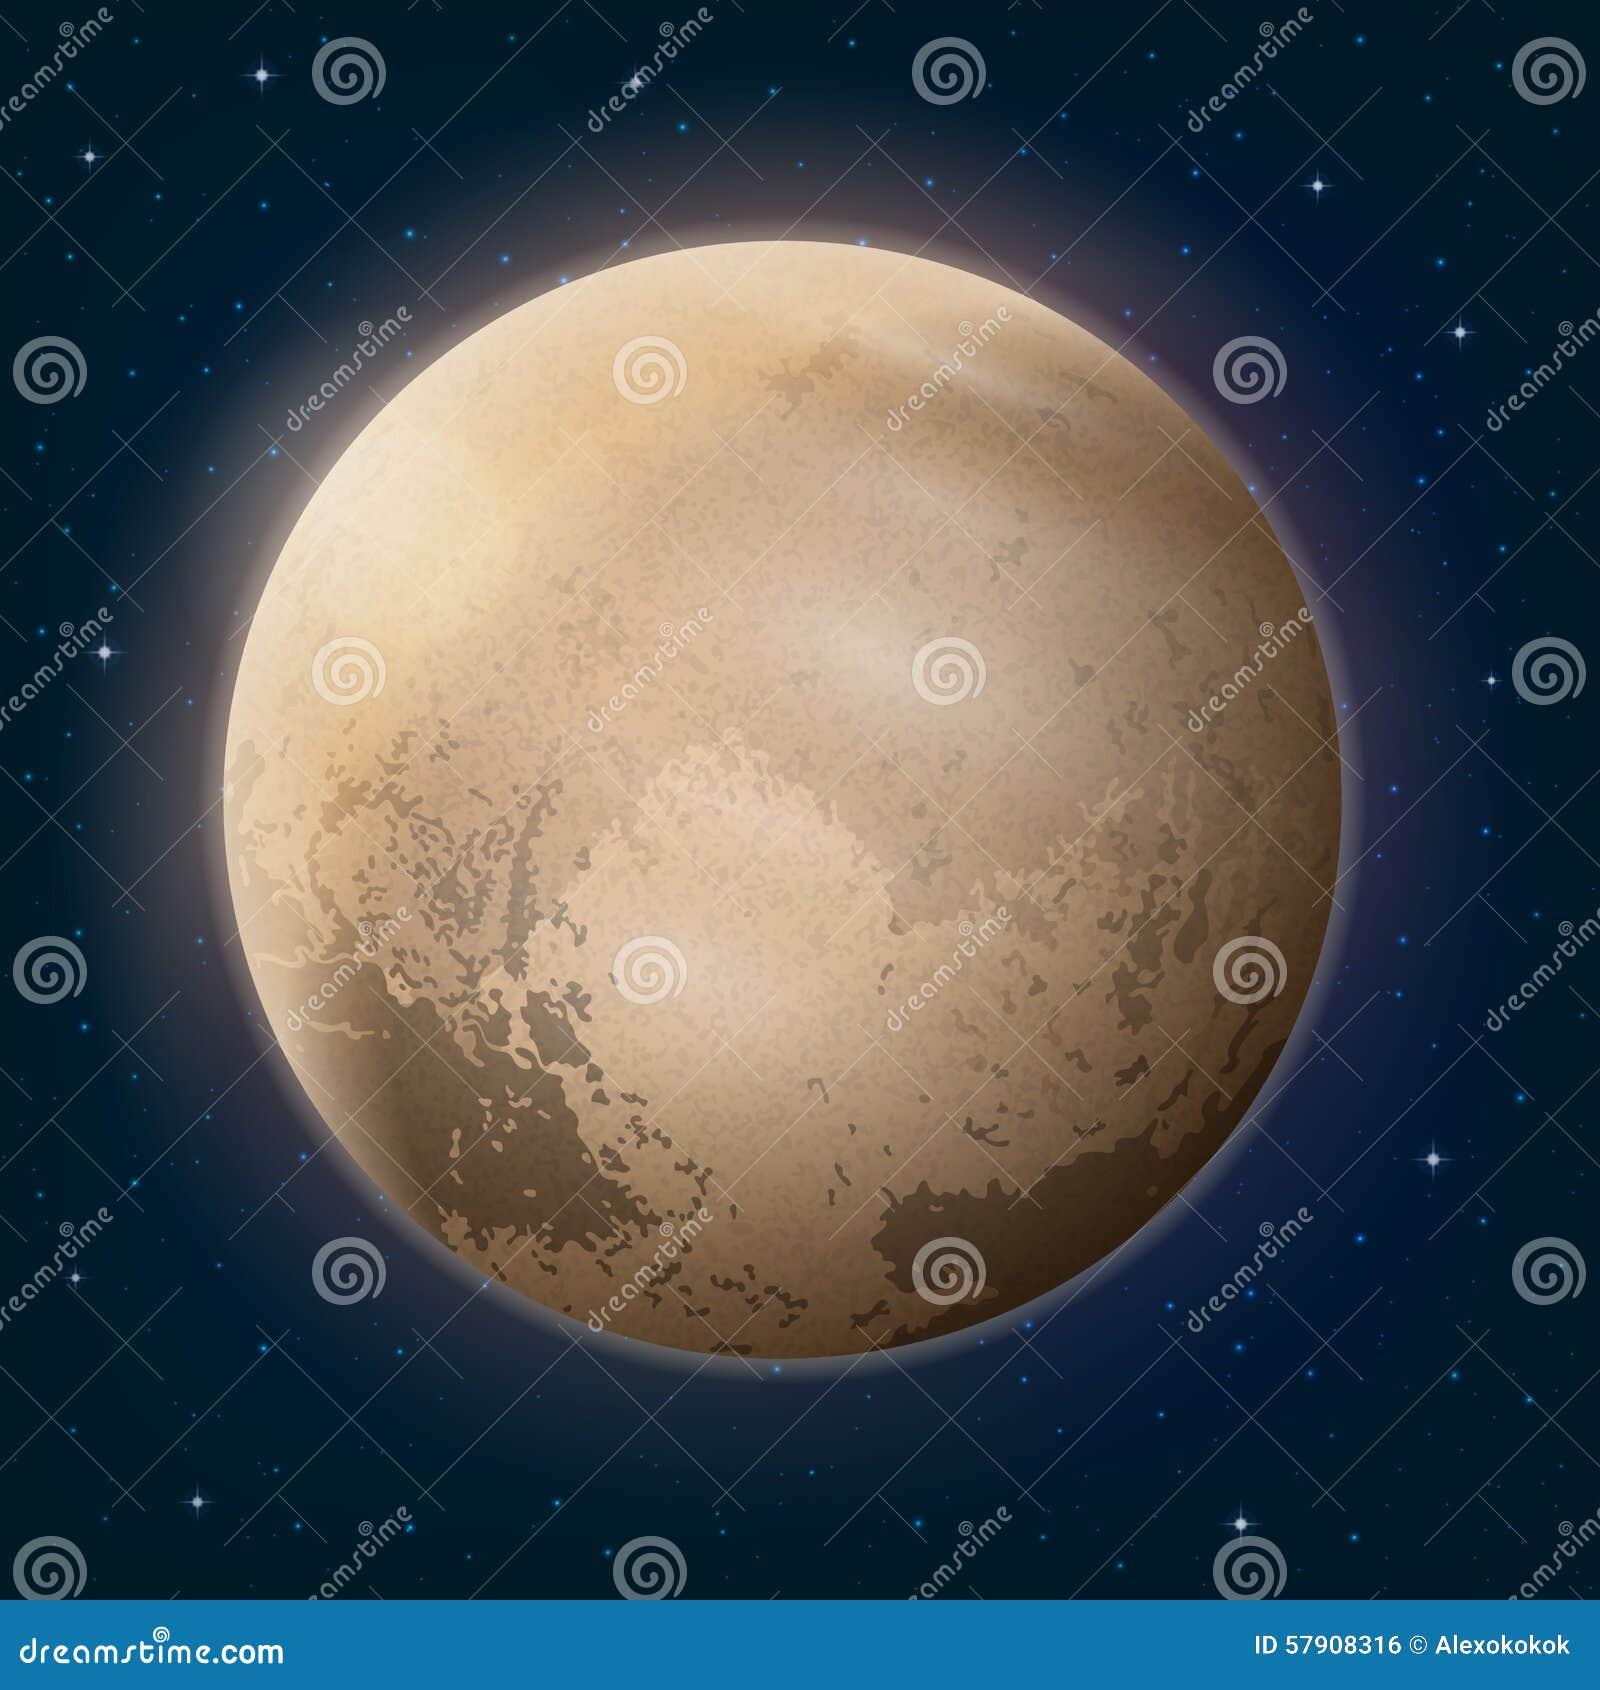 elements present on planet pluto - photo #26